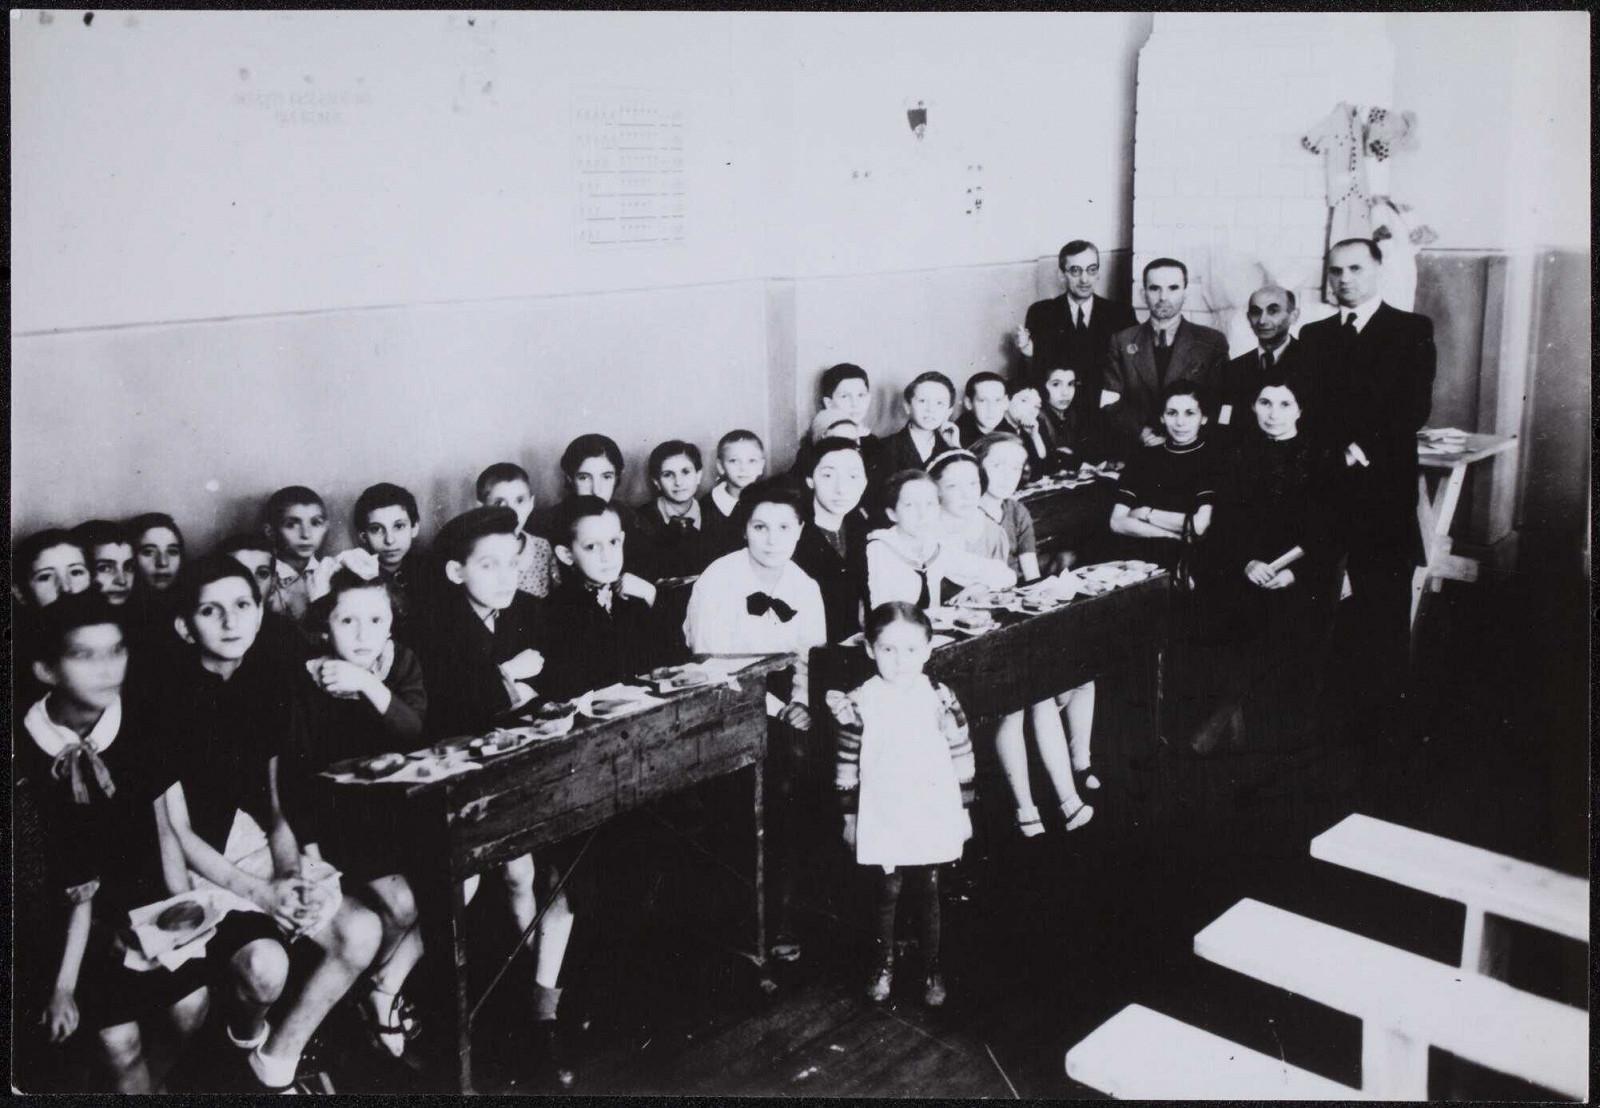 Fot.: Żydowski Instytut Historyczny